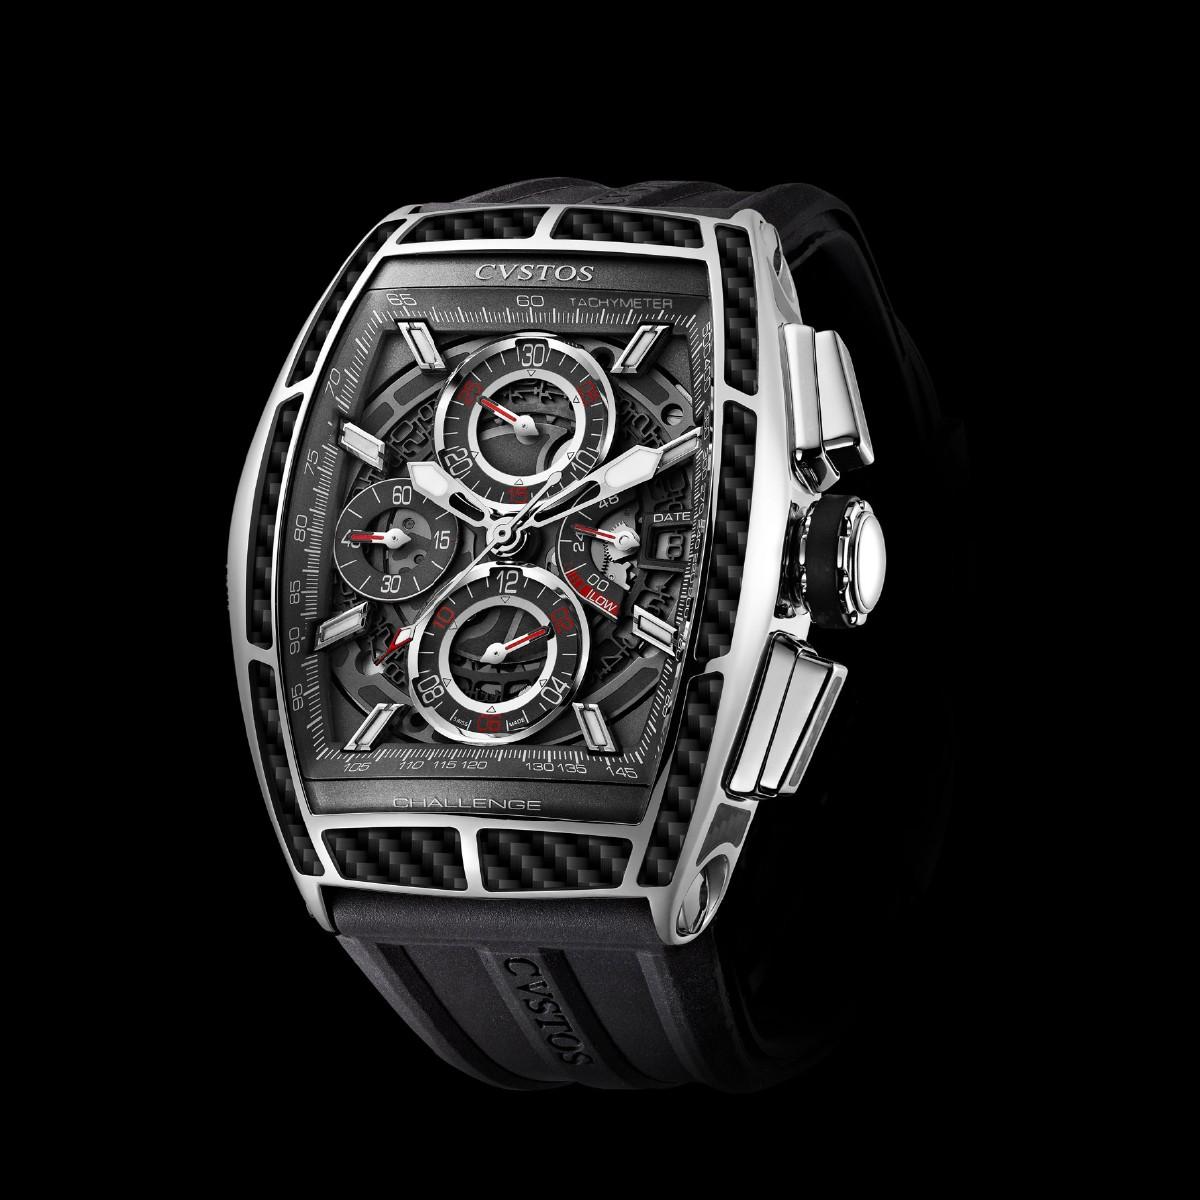 Produkt Cvstos Challenge Chrono II GT Steel Carbon Preis